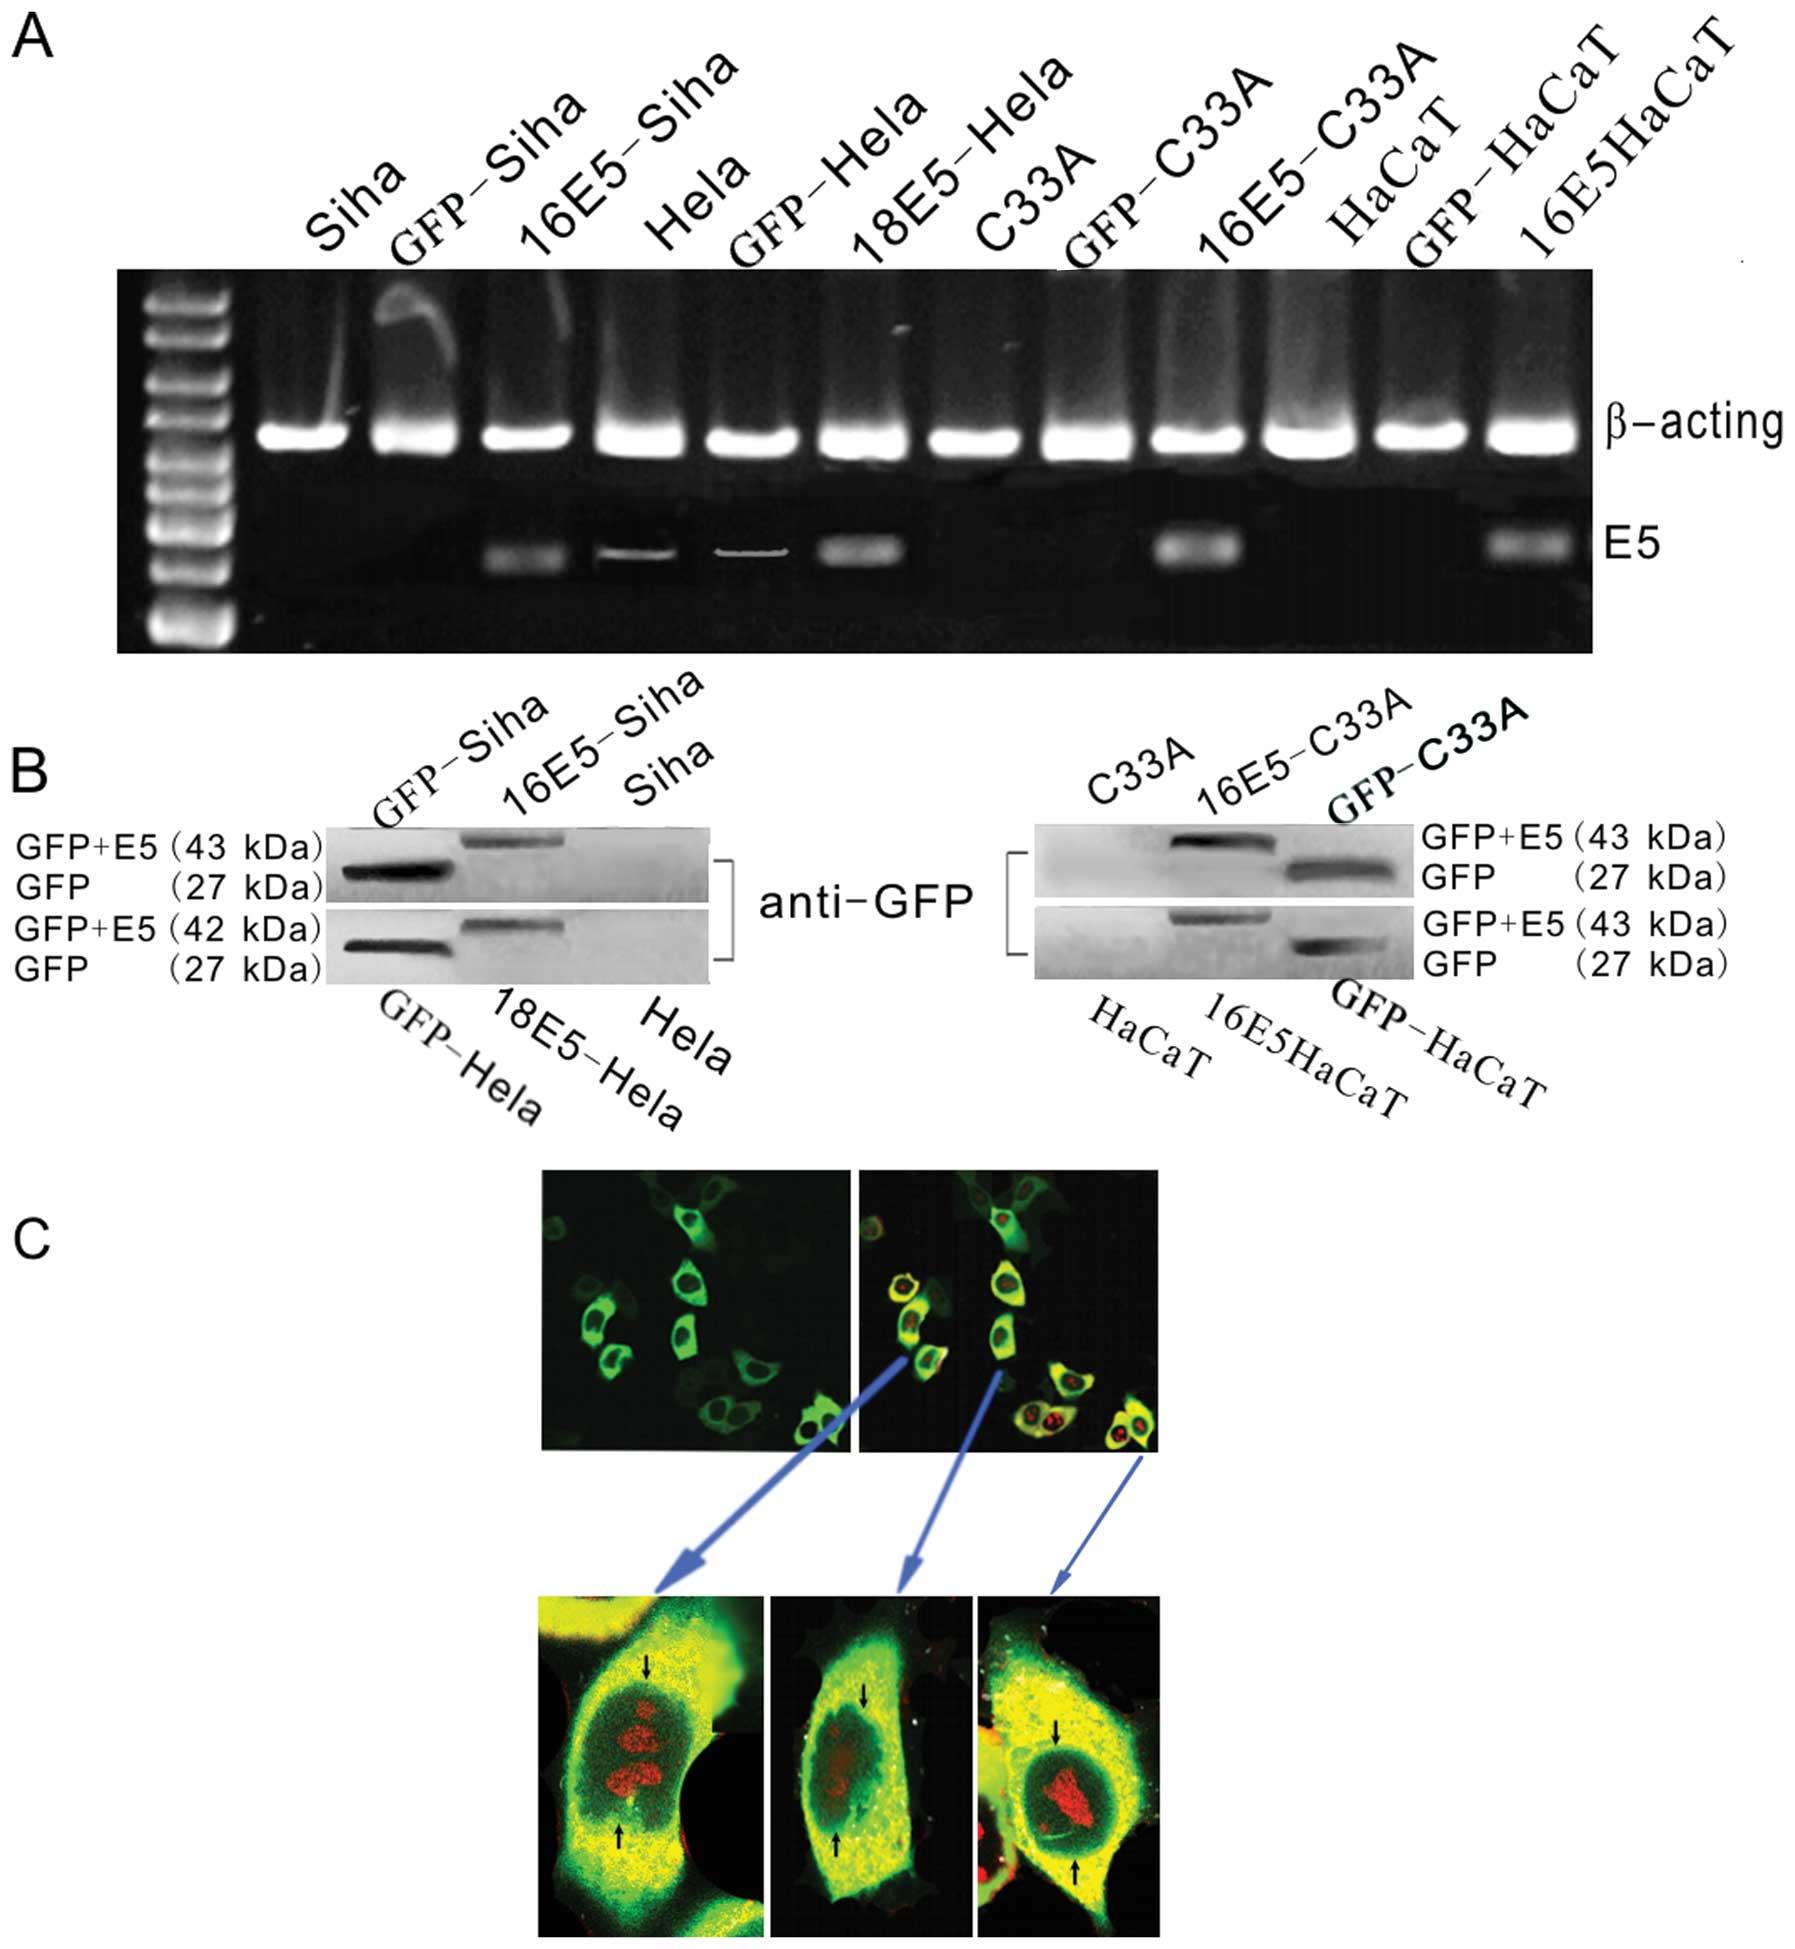 Human papillomavirus 16/18 E5 promotes cervical cancer cell